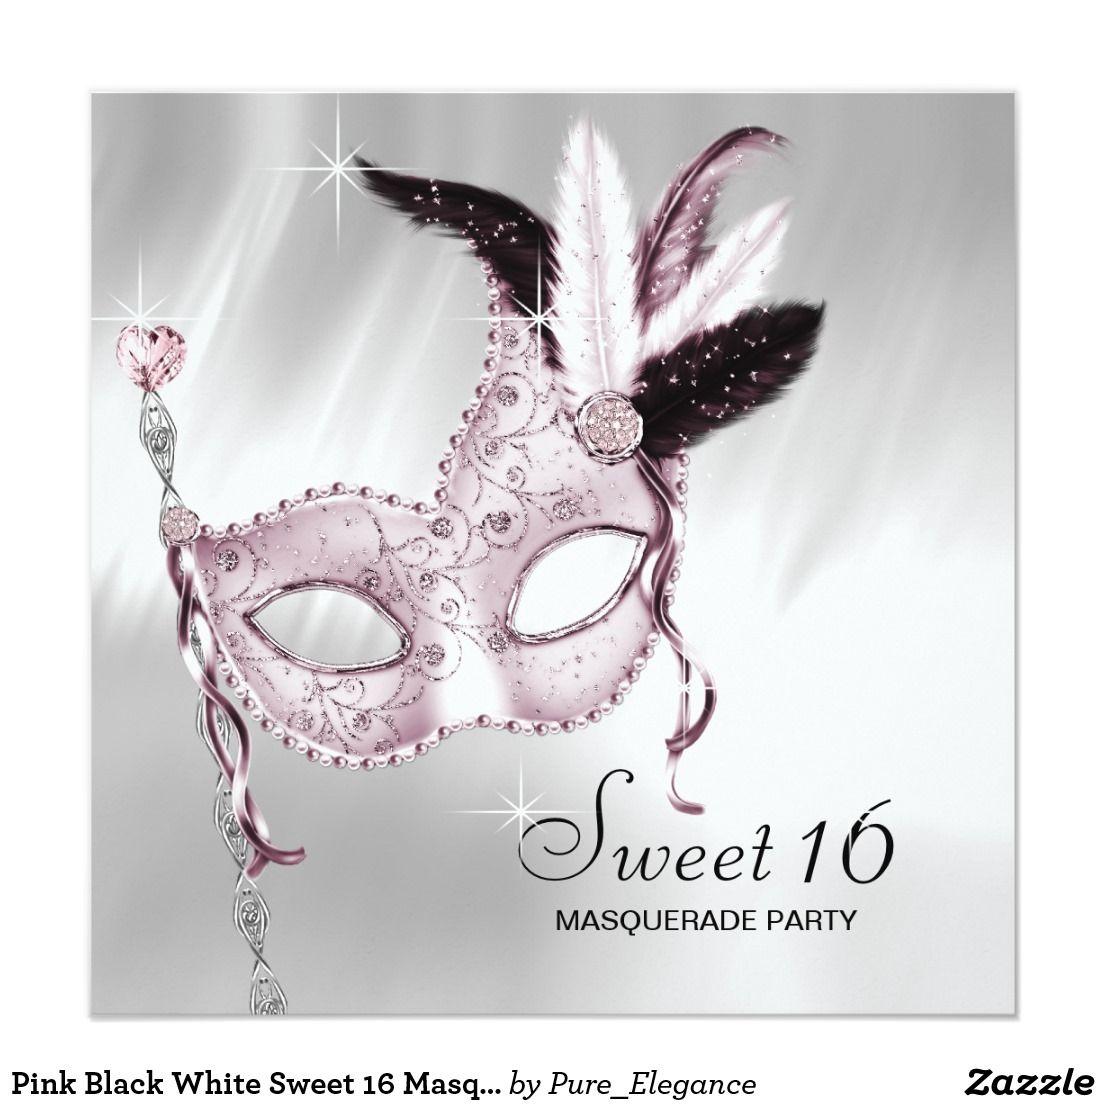 Pink Black White Sweet 16 Masquerade Party Card | Pink sweet 16 ...